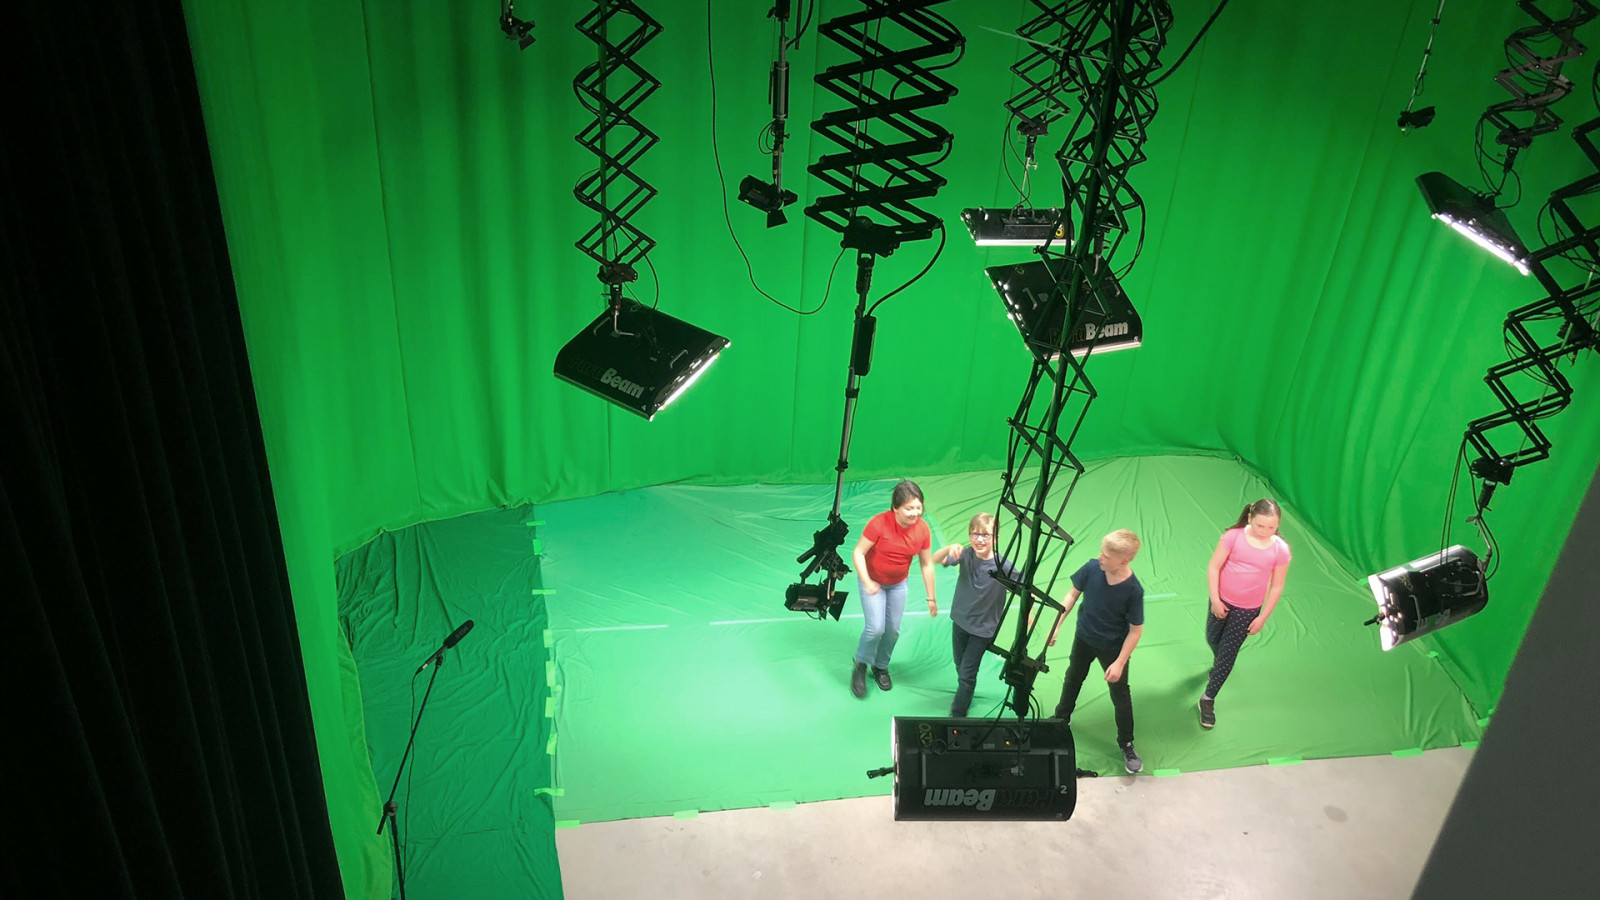 Royal Life Saving Society –image from the green screen video shoot - Gallery image for Royal Life Saving Society project